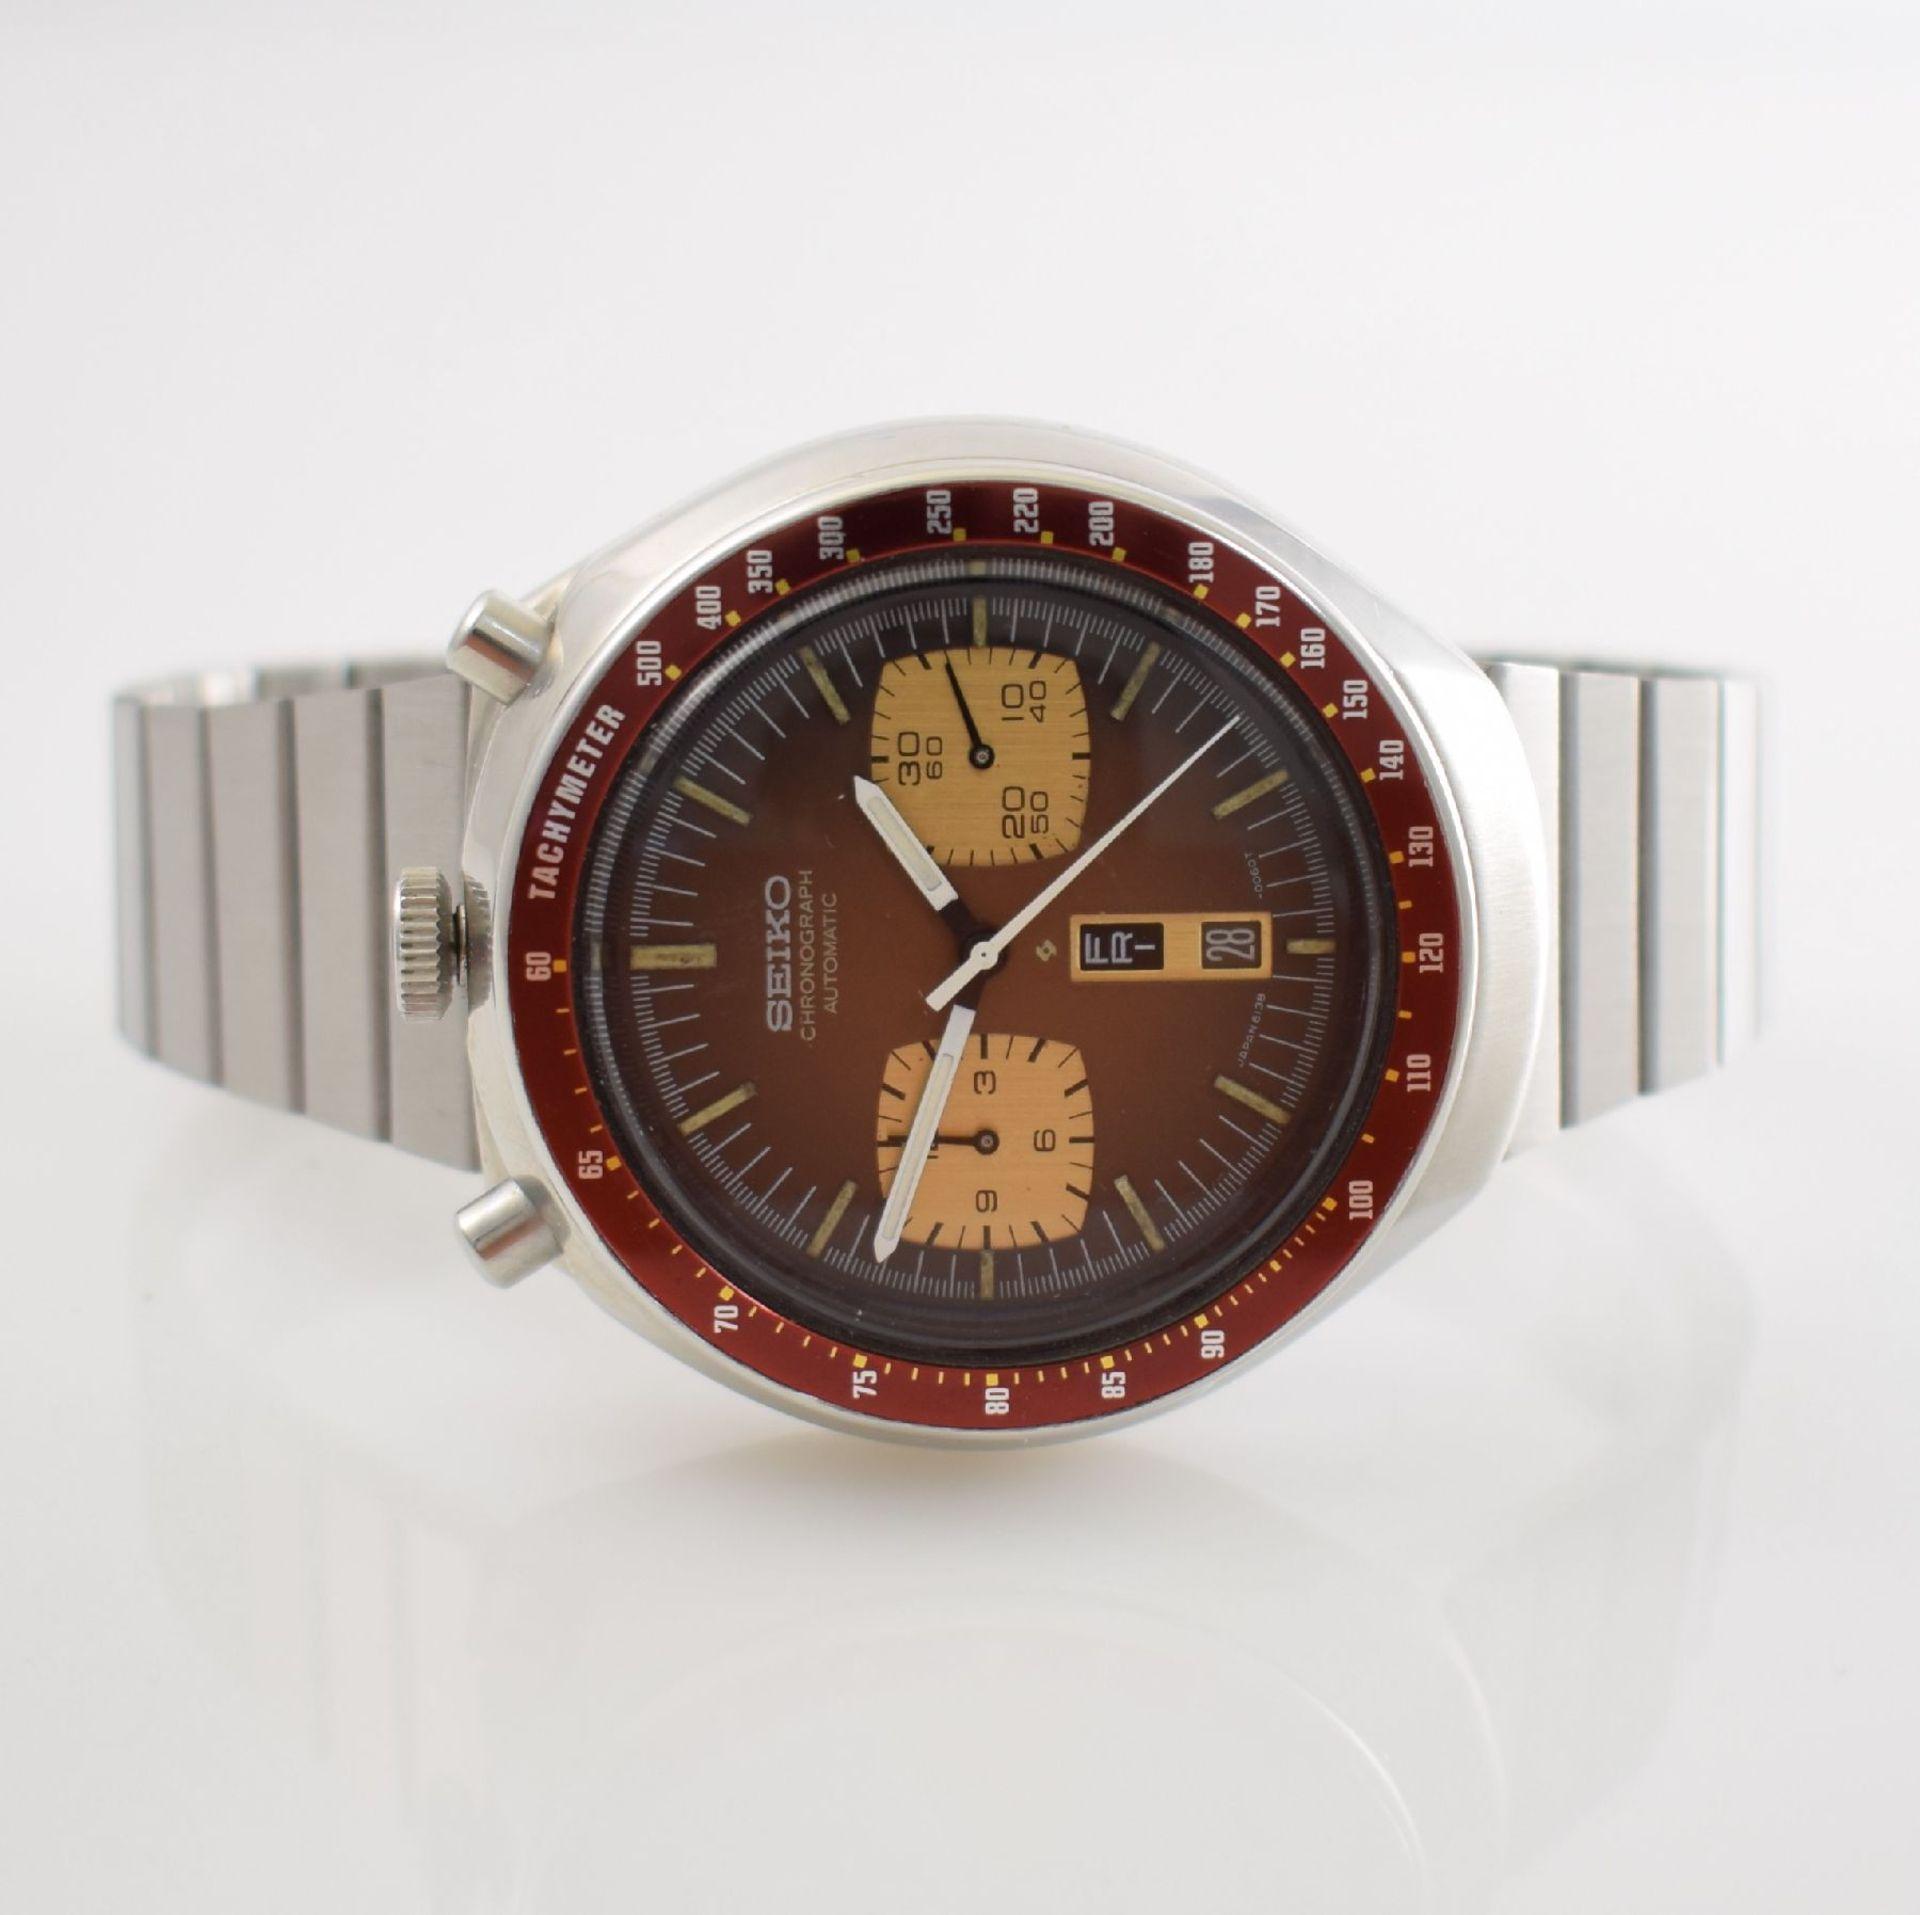 SEIKO sog. BULLHEAD Armbandchronograph, Japan um 1970, Automatik, Ref. 6138-0040, verschr.